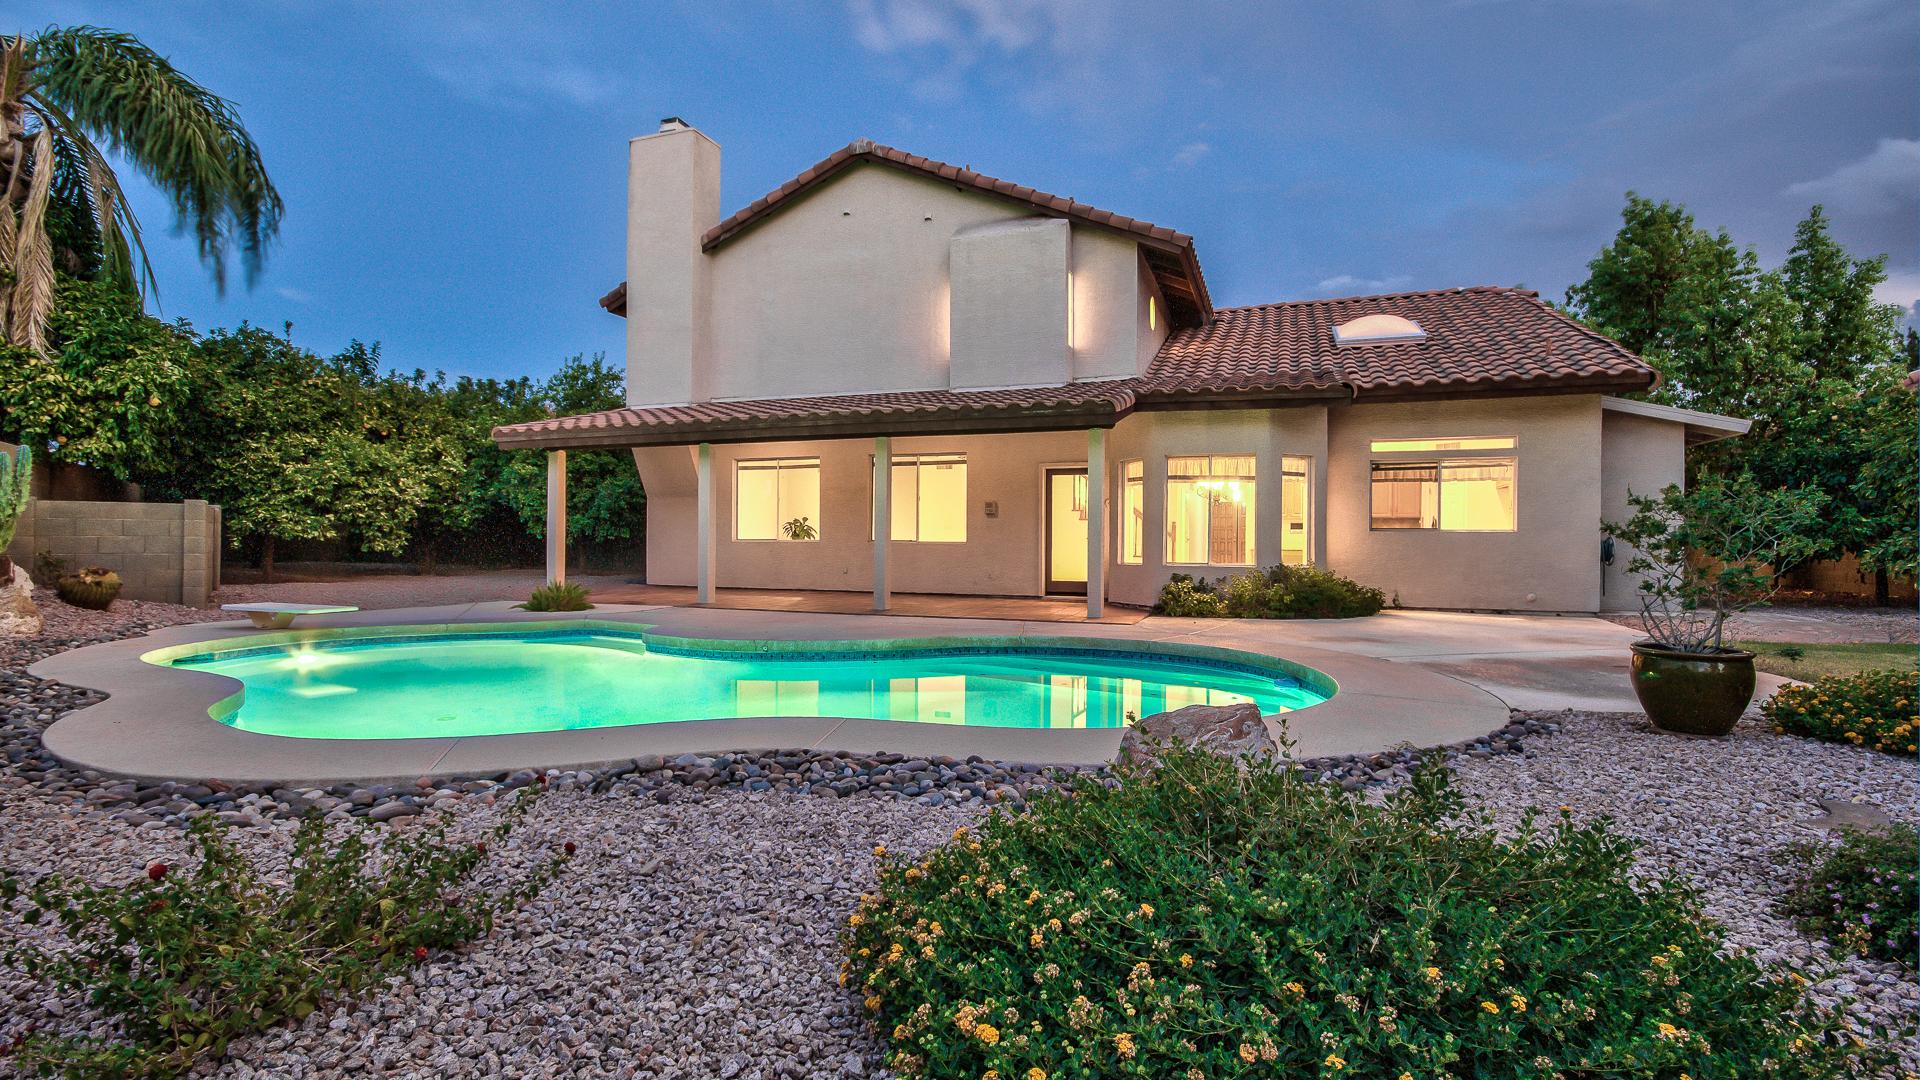 Gorgeous Large Lot Scottsdale Pool Property – 4 bedrooms ~ 2.75 baths ~ Fireplace ~ RV gate under 450k